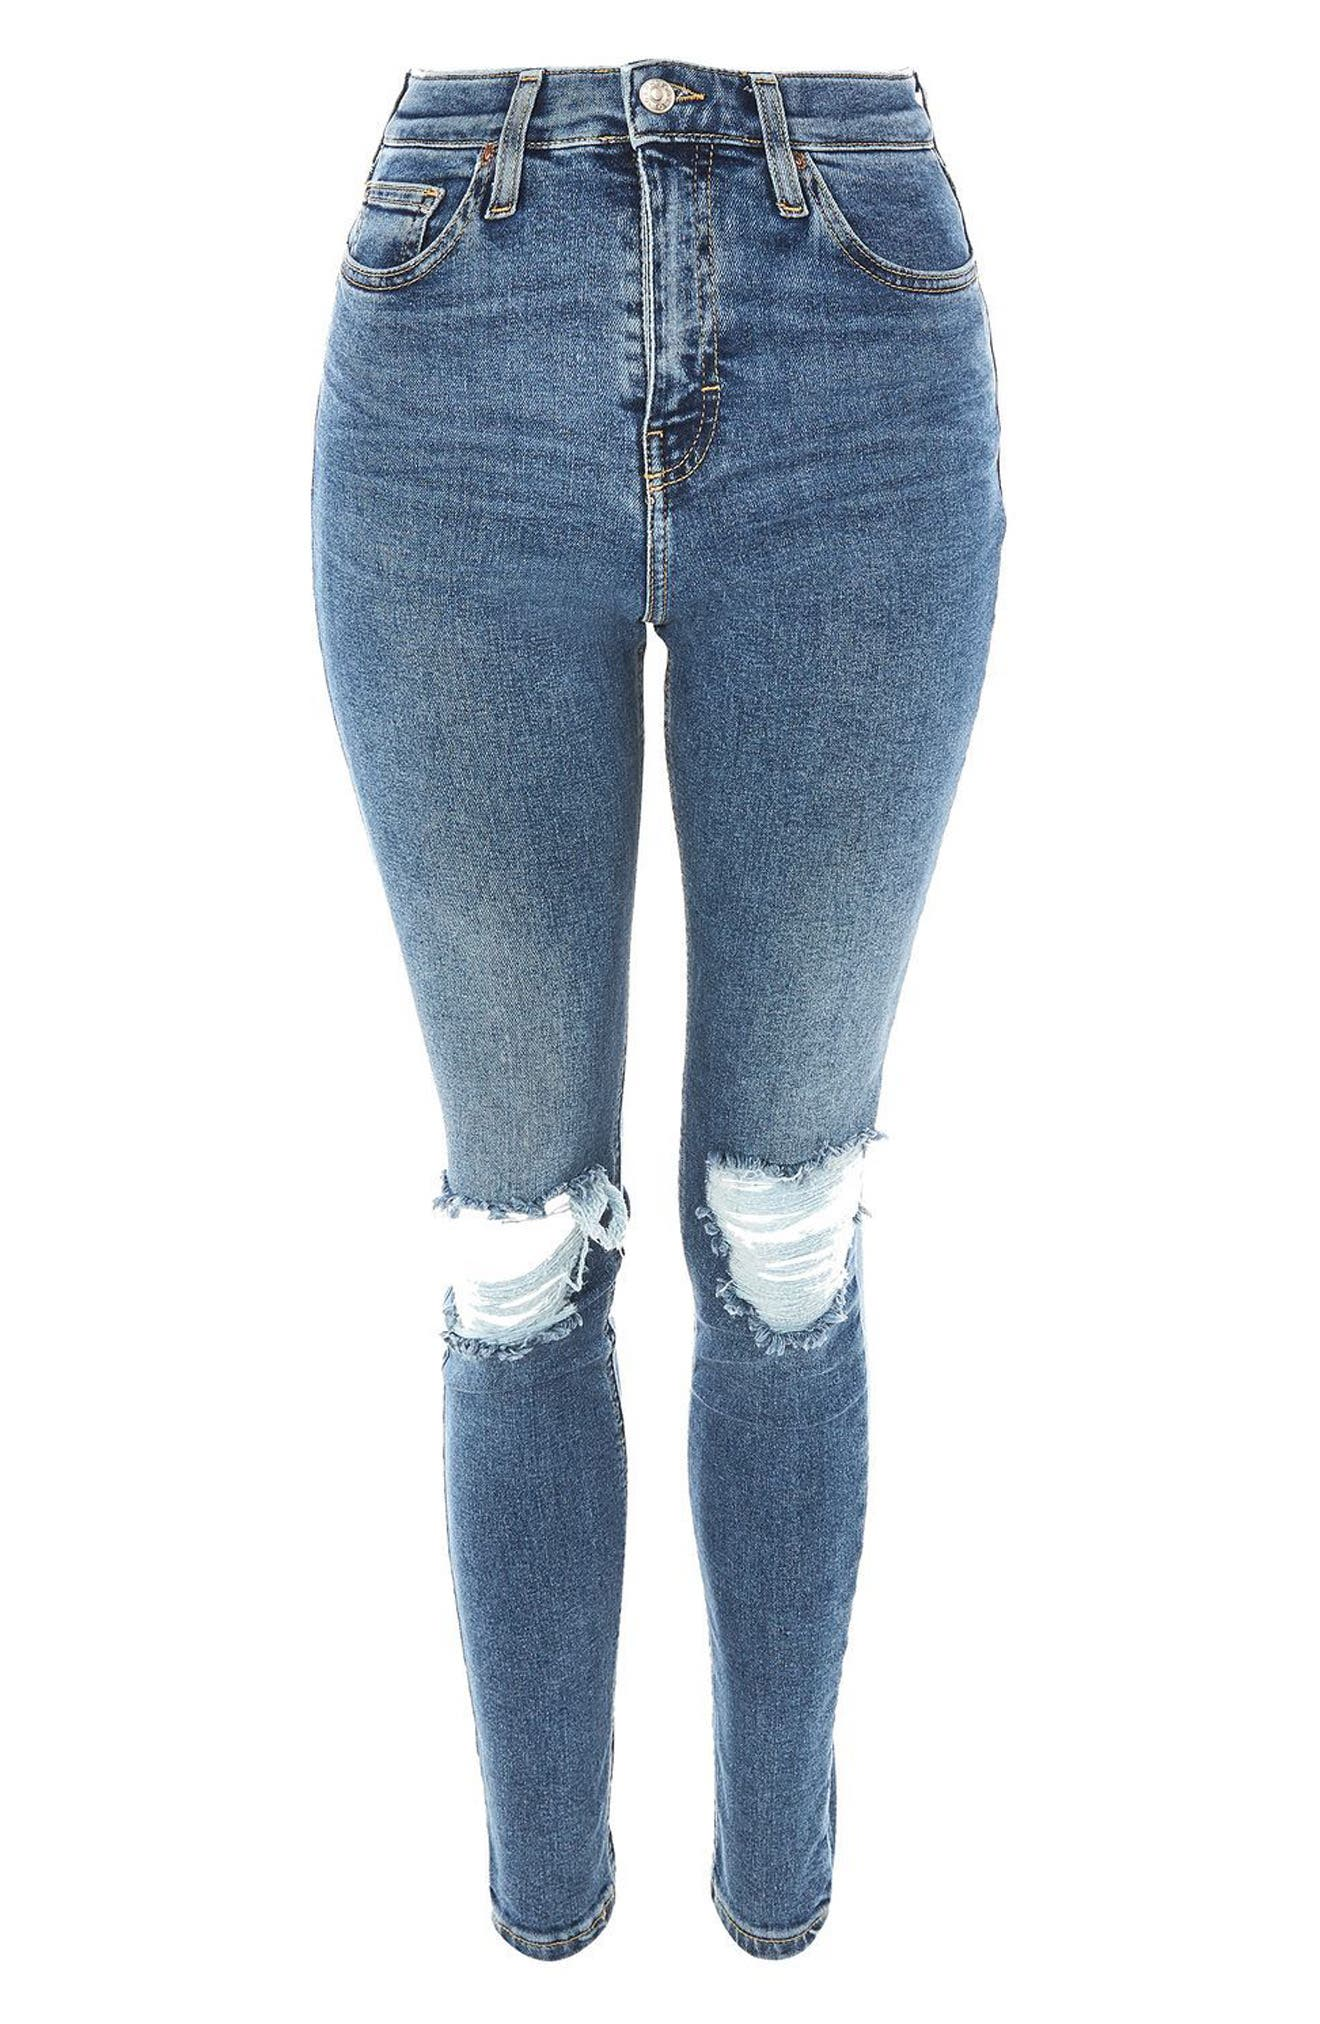 Jamie Rip High Waist Skinny Jeans,                             Alternate thumbnail 4, color,                             Mid Denim